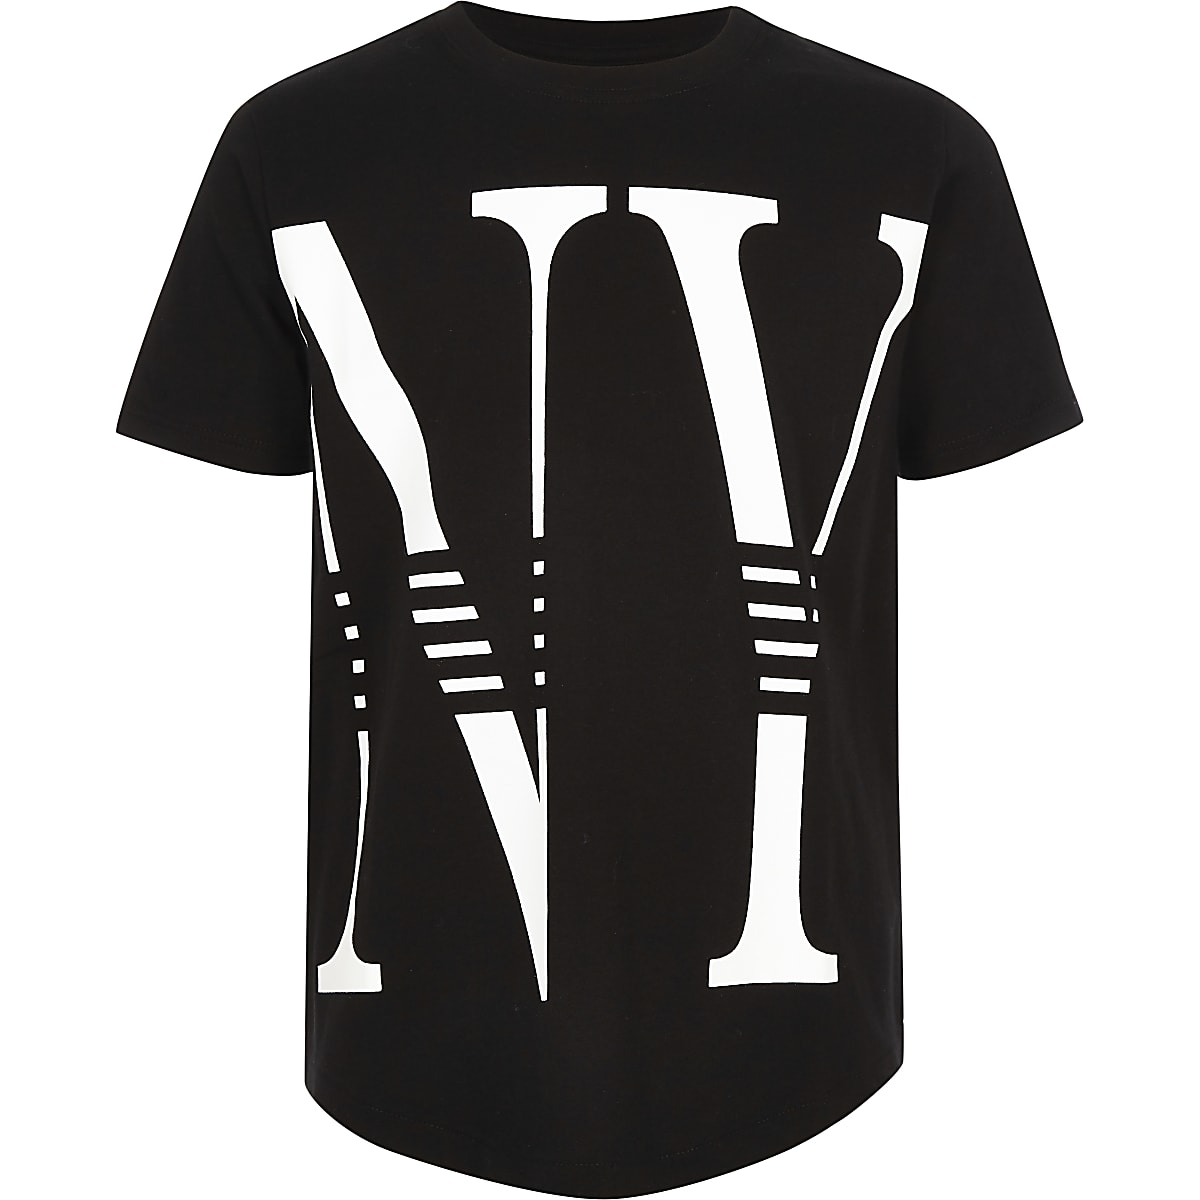 Boys black 'NY' print T-shirt